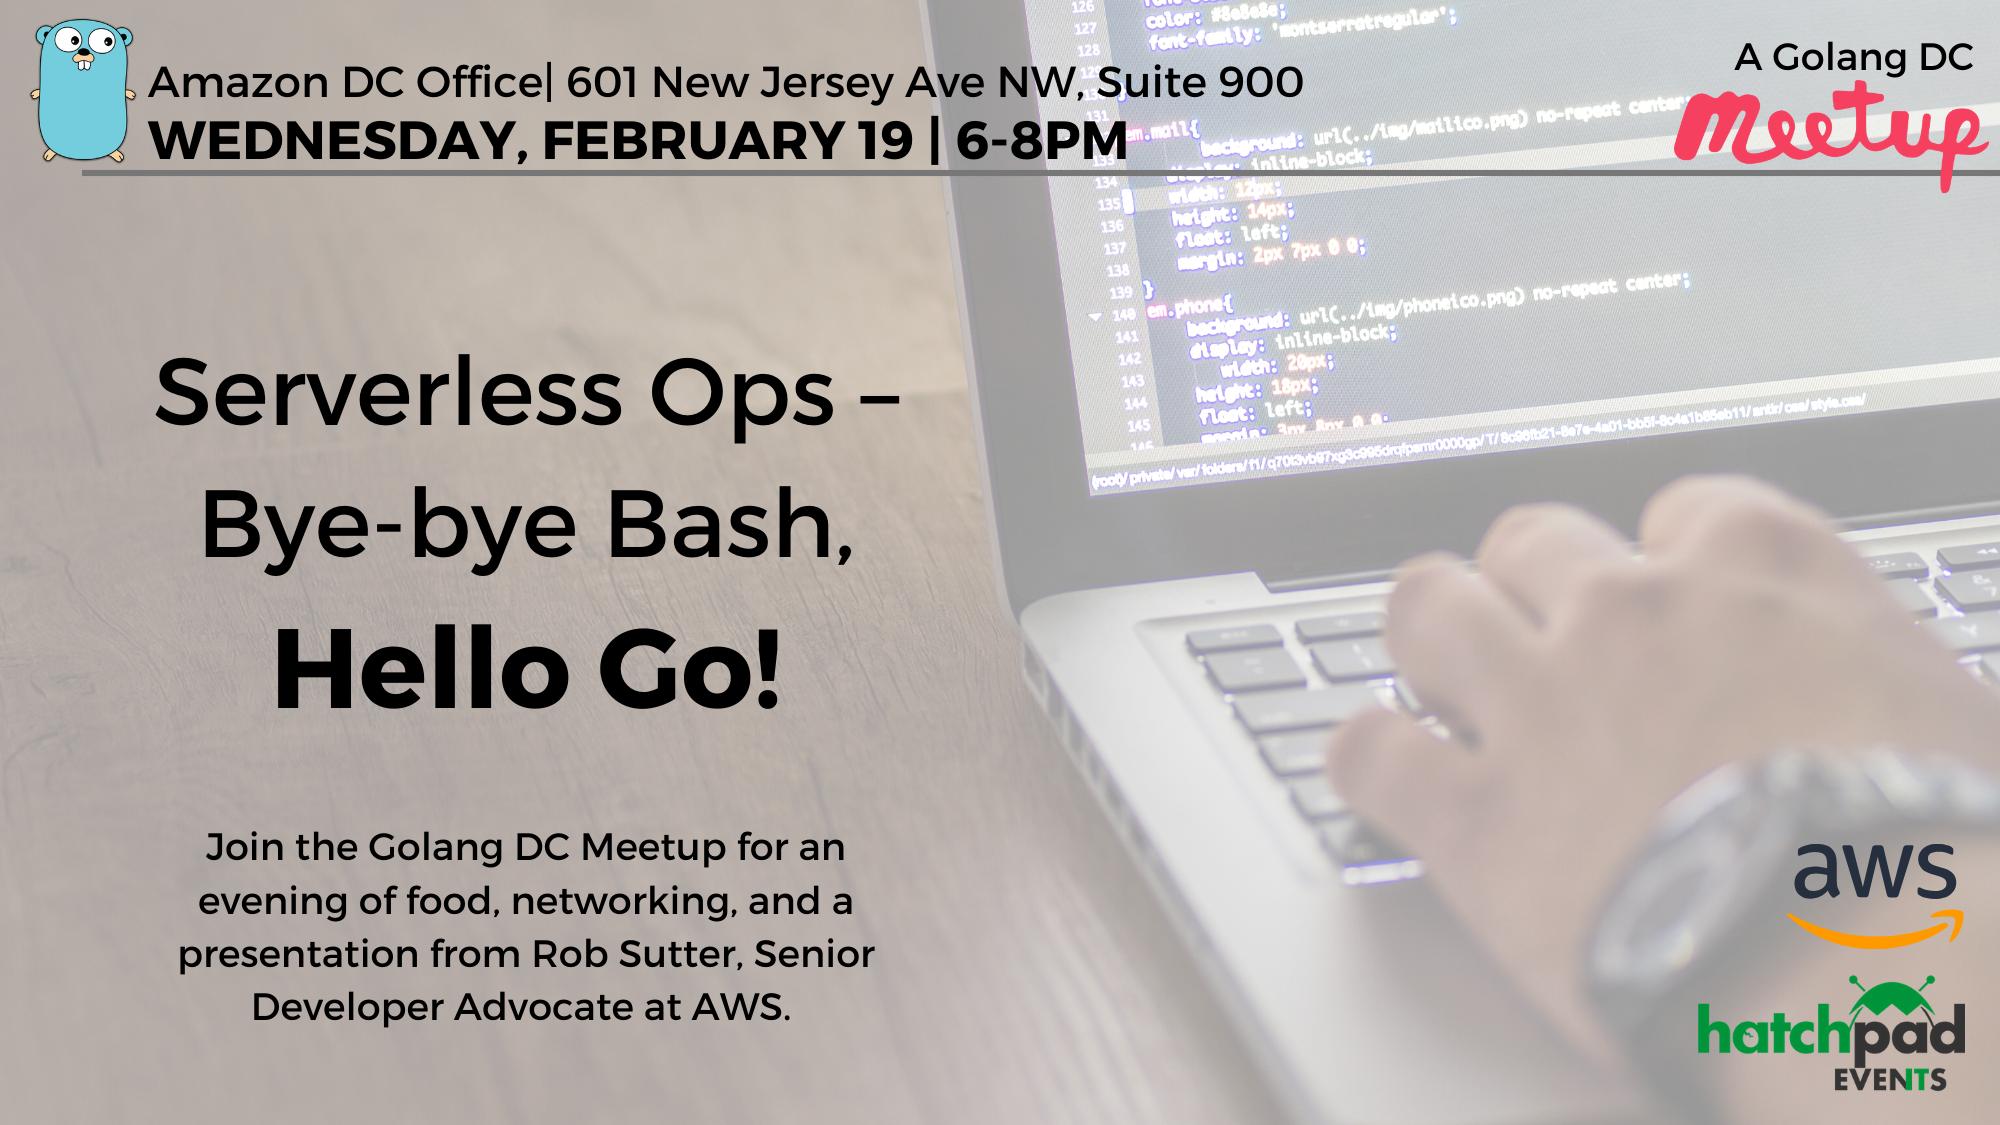 Serverless Ops – Bye-bye Bash, Hello Go!